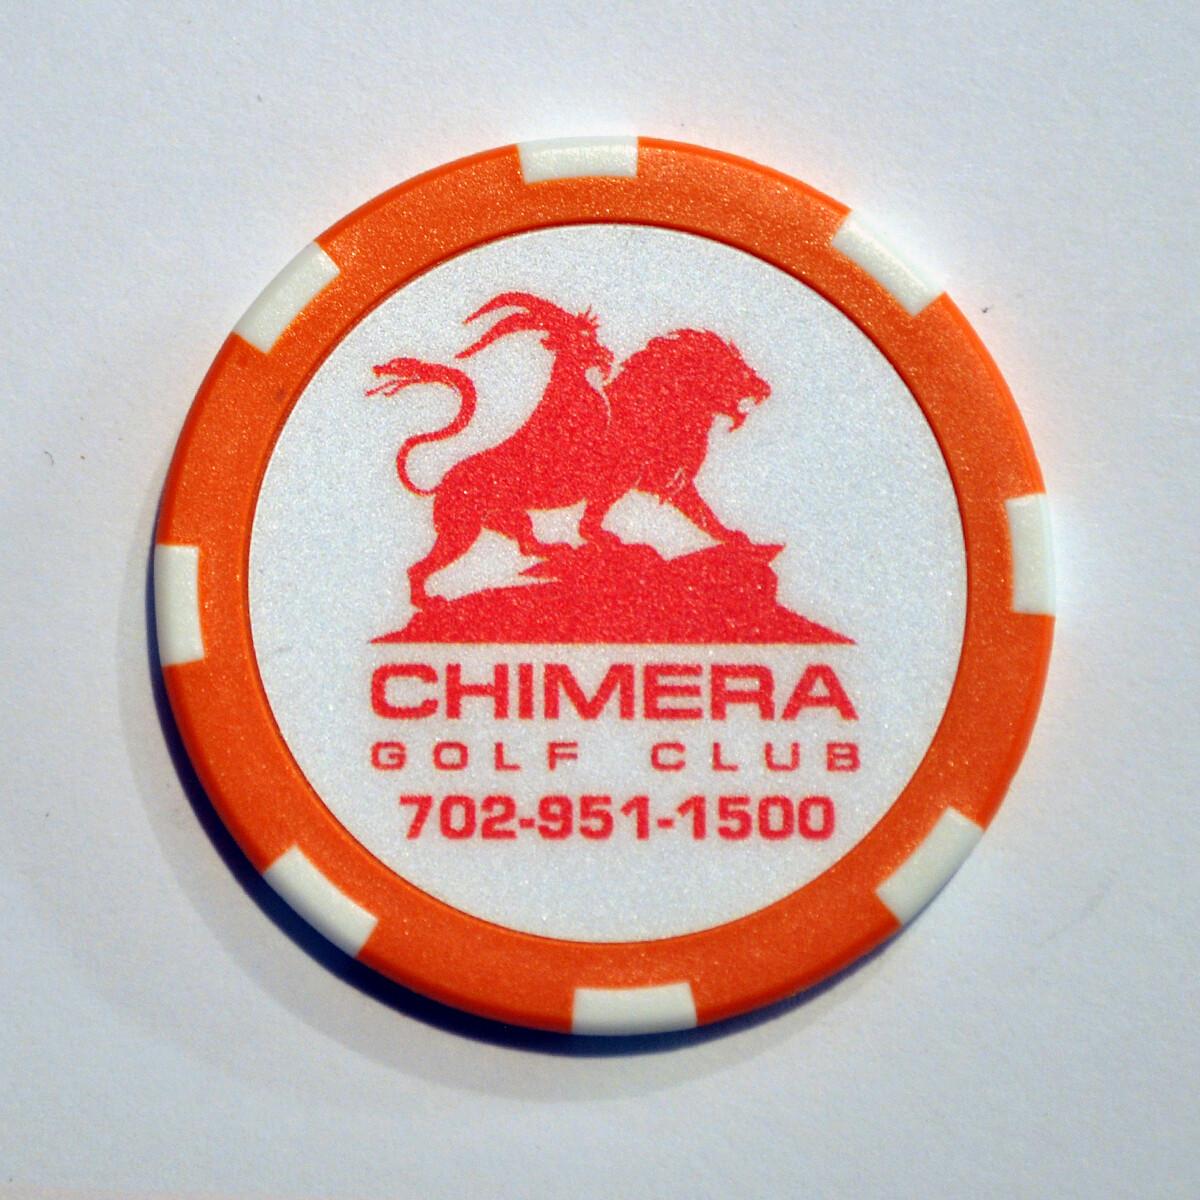 Poker Chip - Chimera - Orange/White